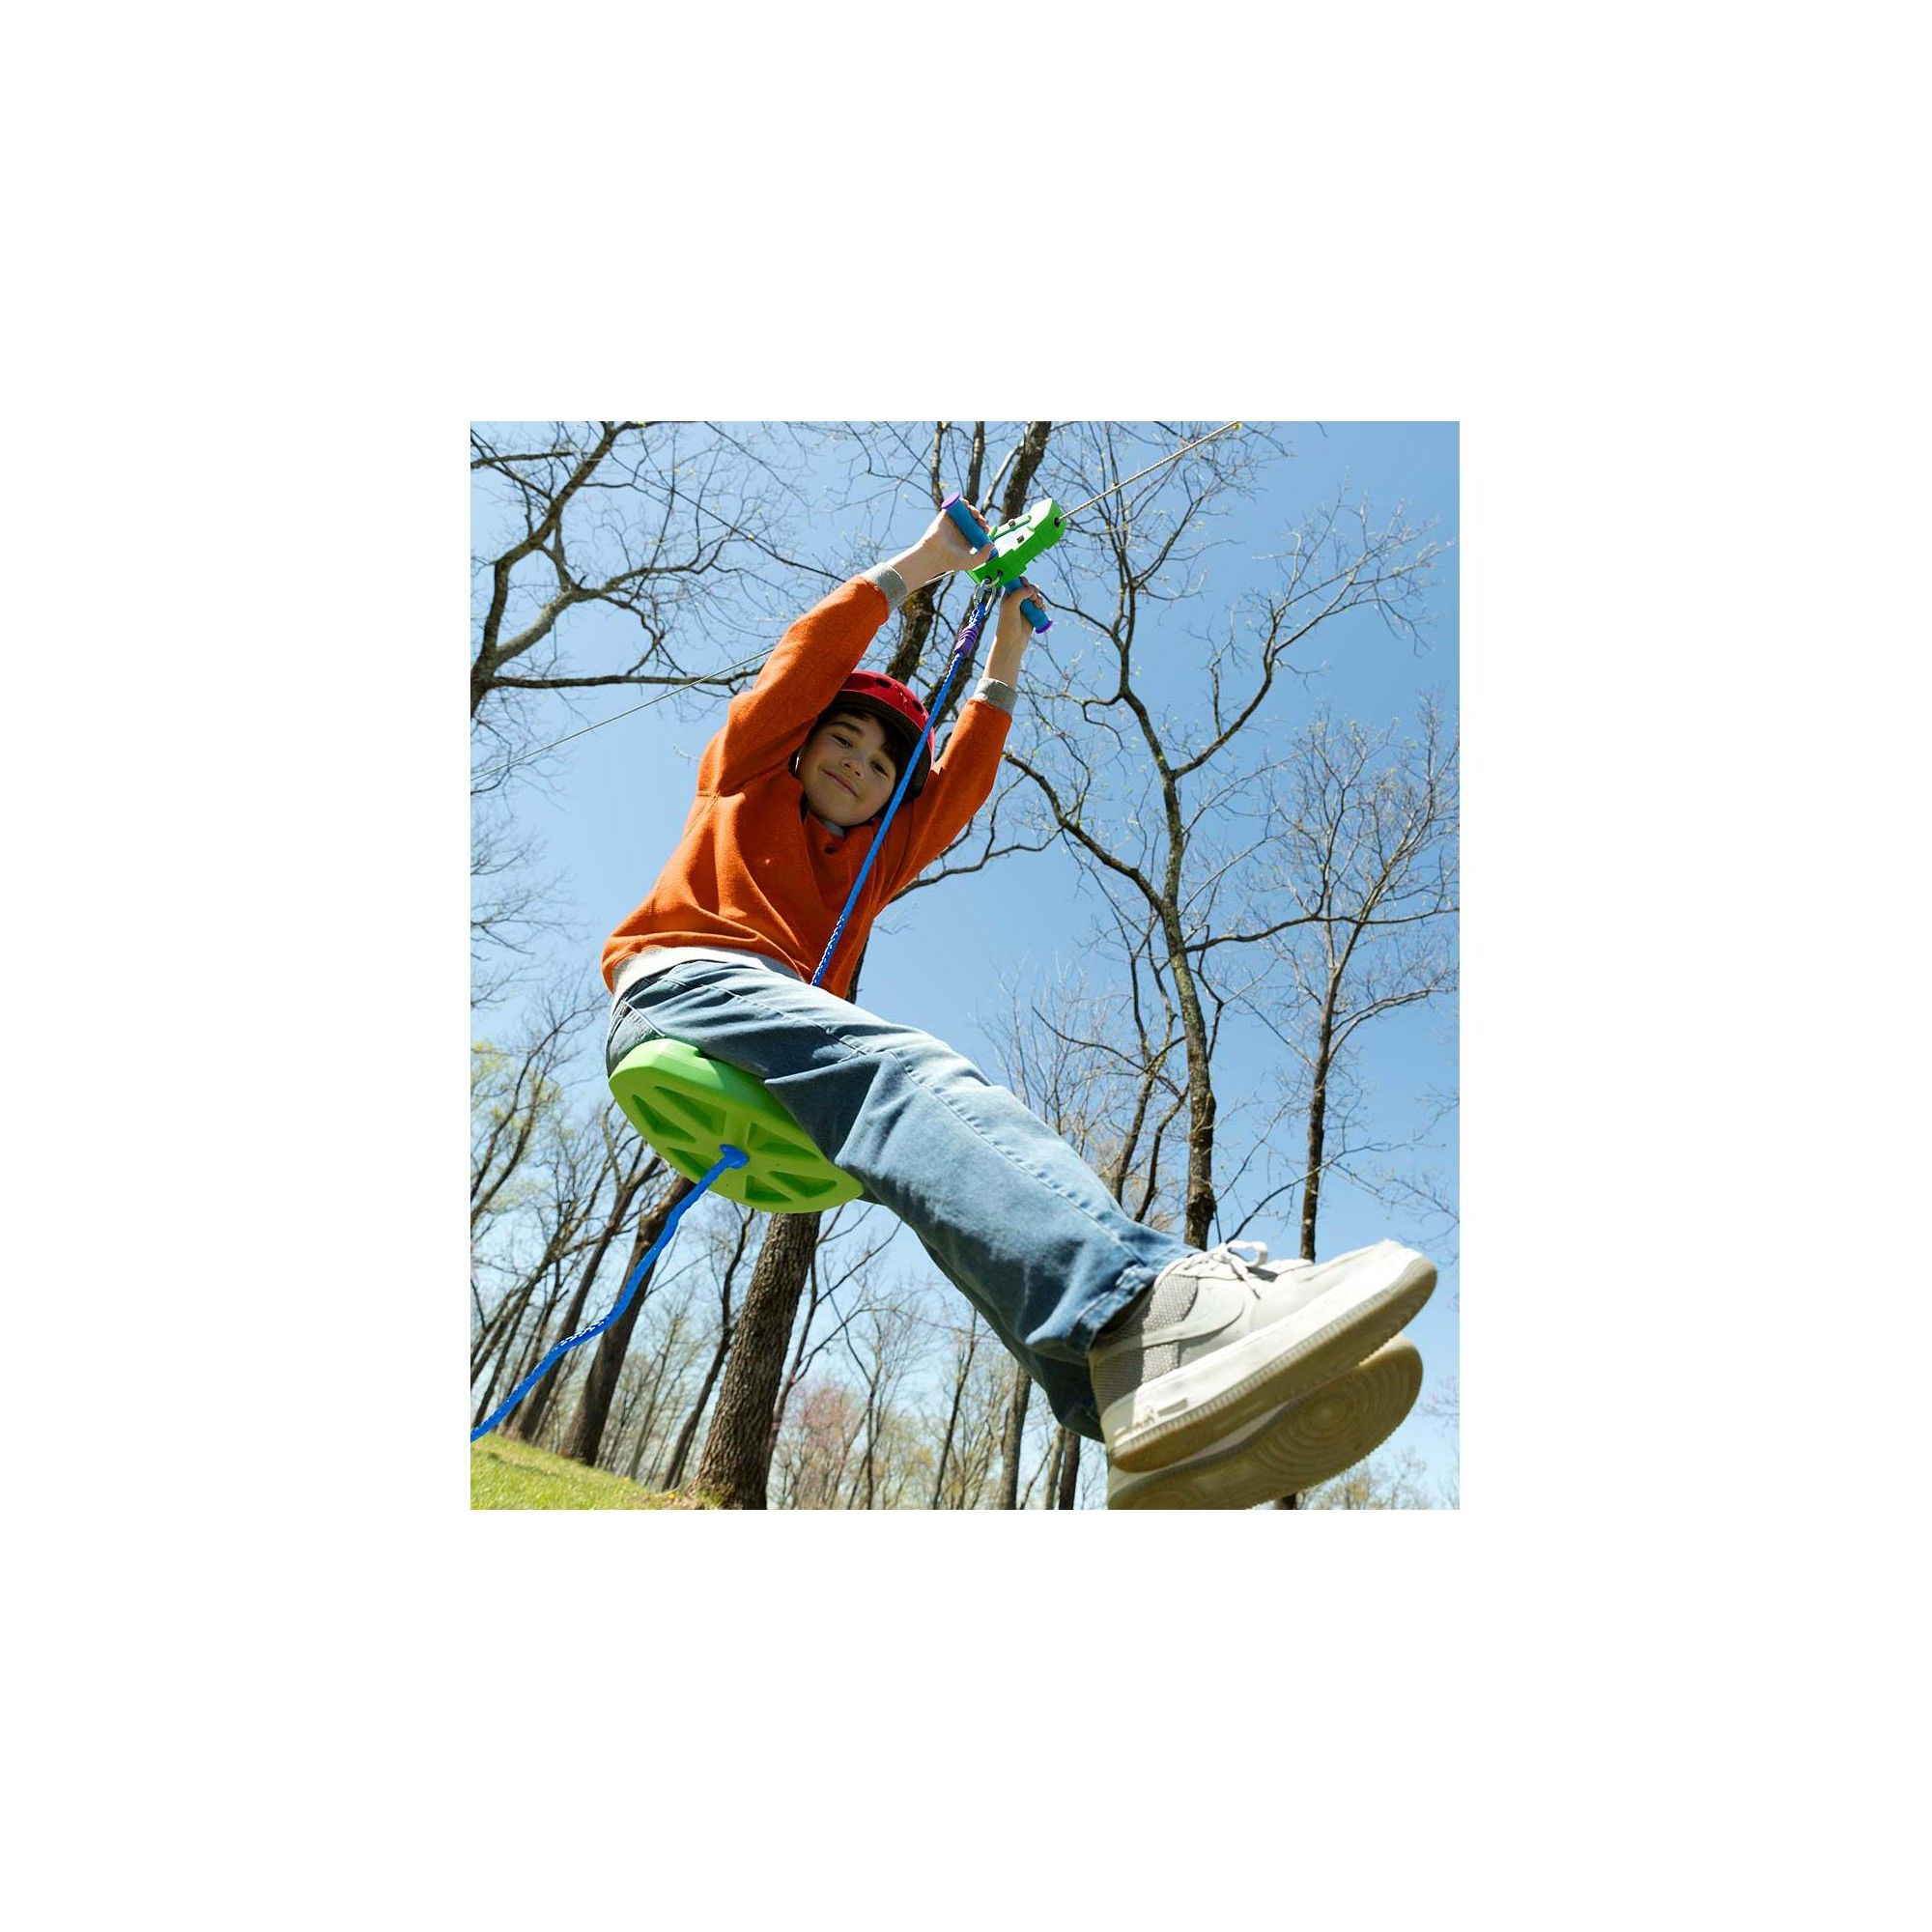 Backyard Zipline Kit For Kids Outdoor Play, 100' L, Green ...